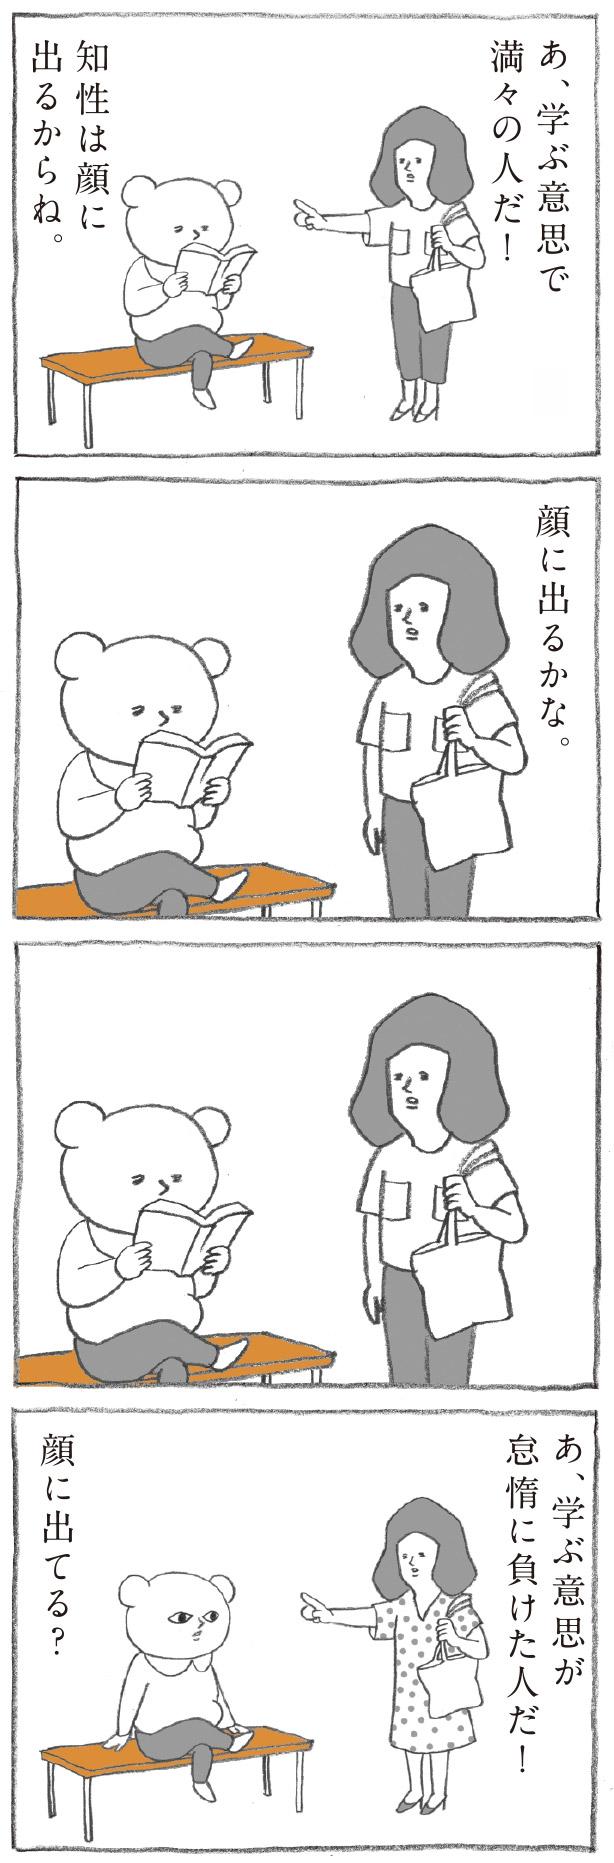 Hanako 1177号:おかわり自由